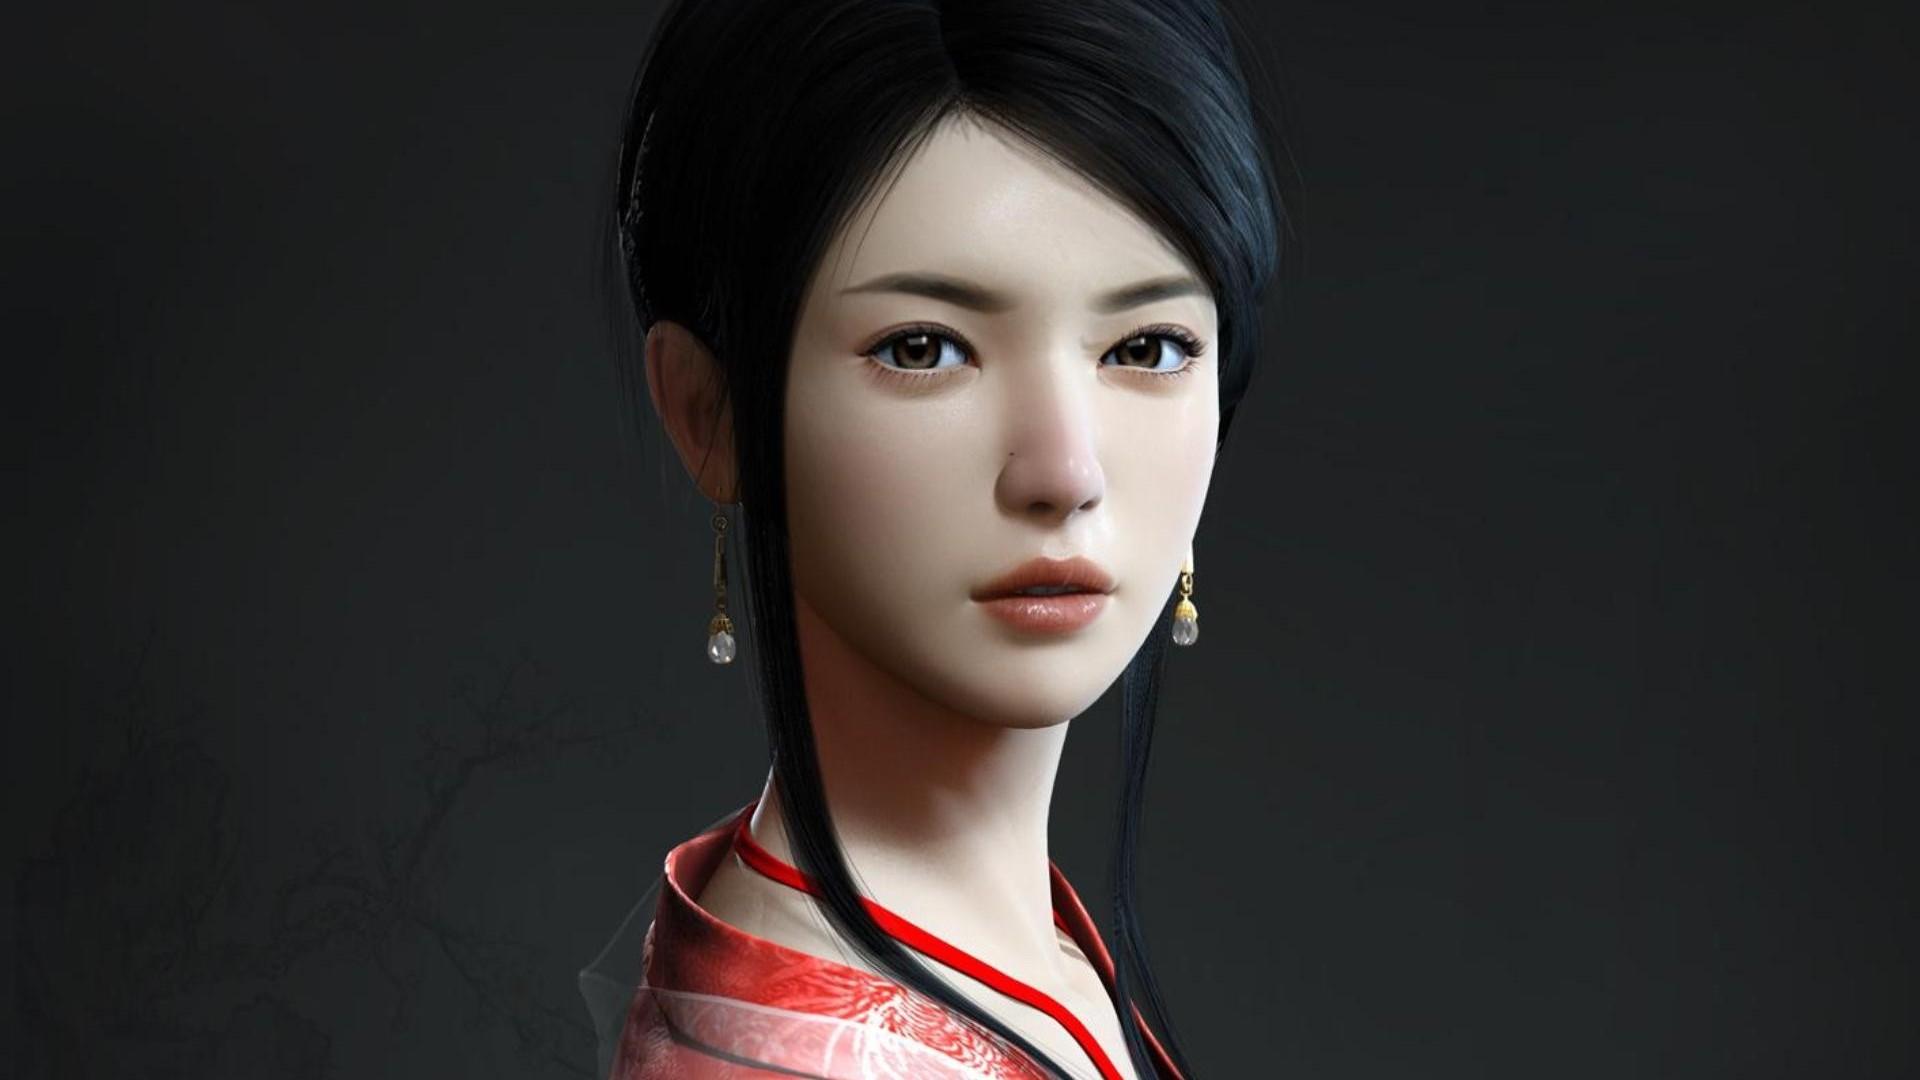 Download Beautiful geisha wallpaper 1920x1080